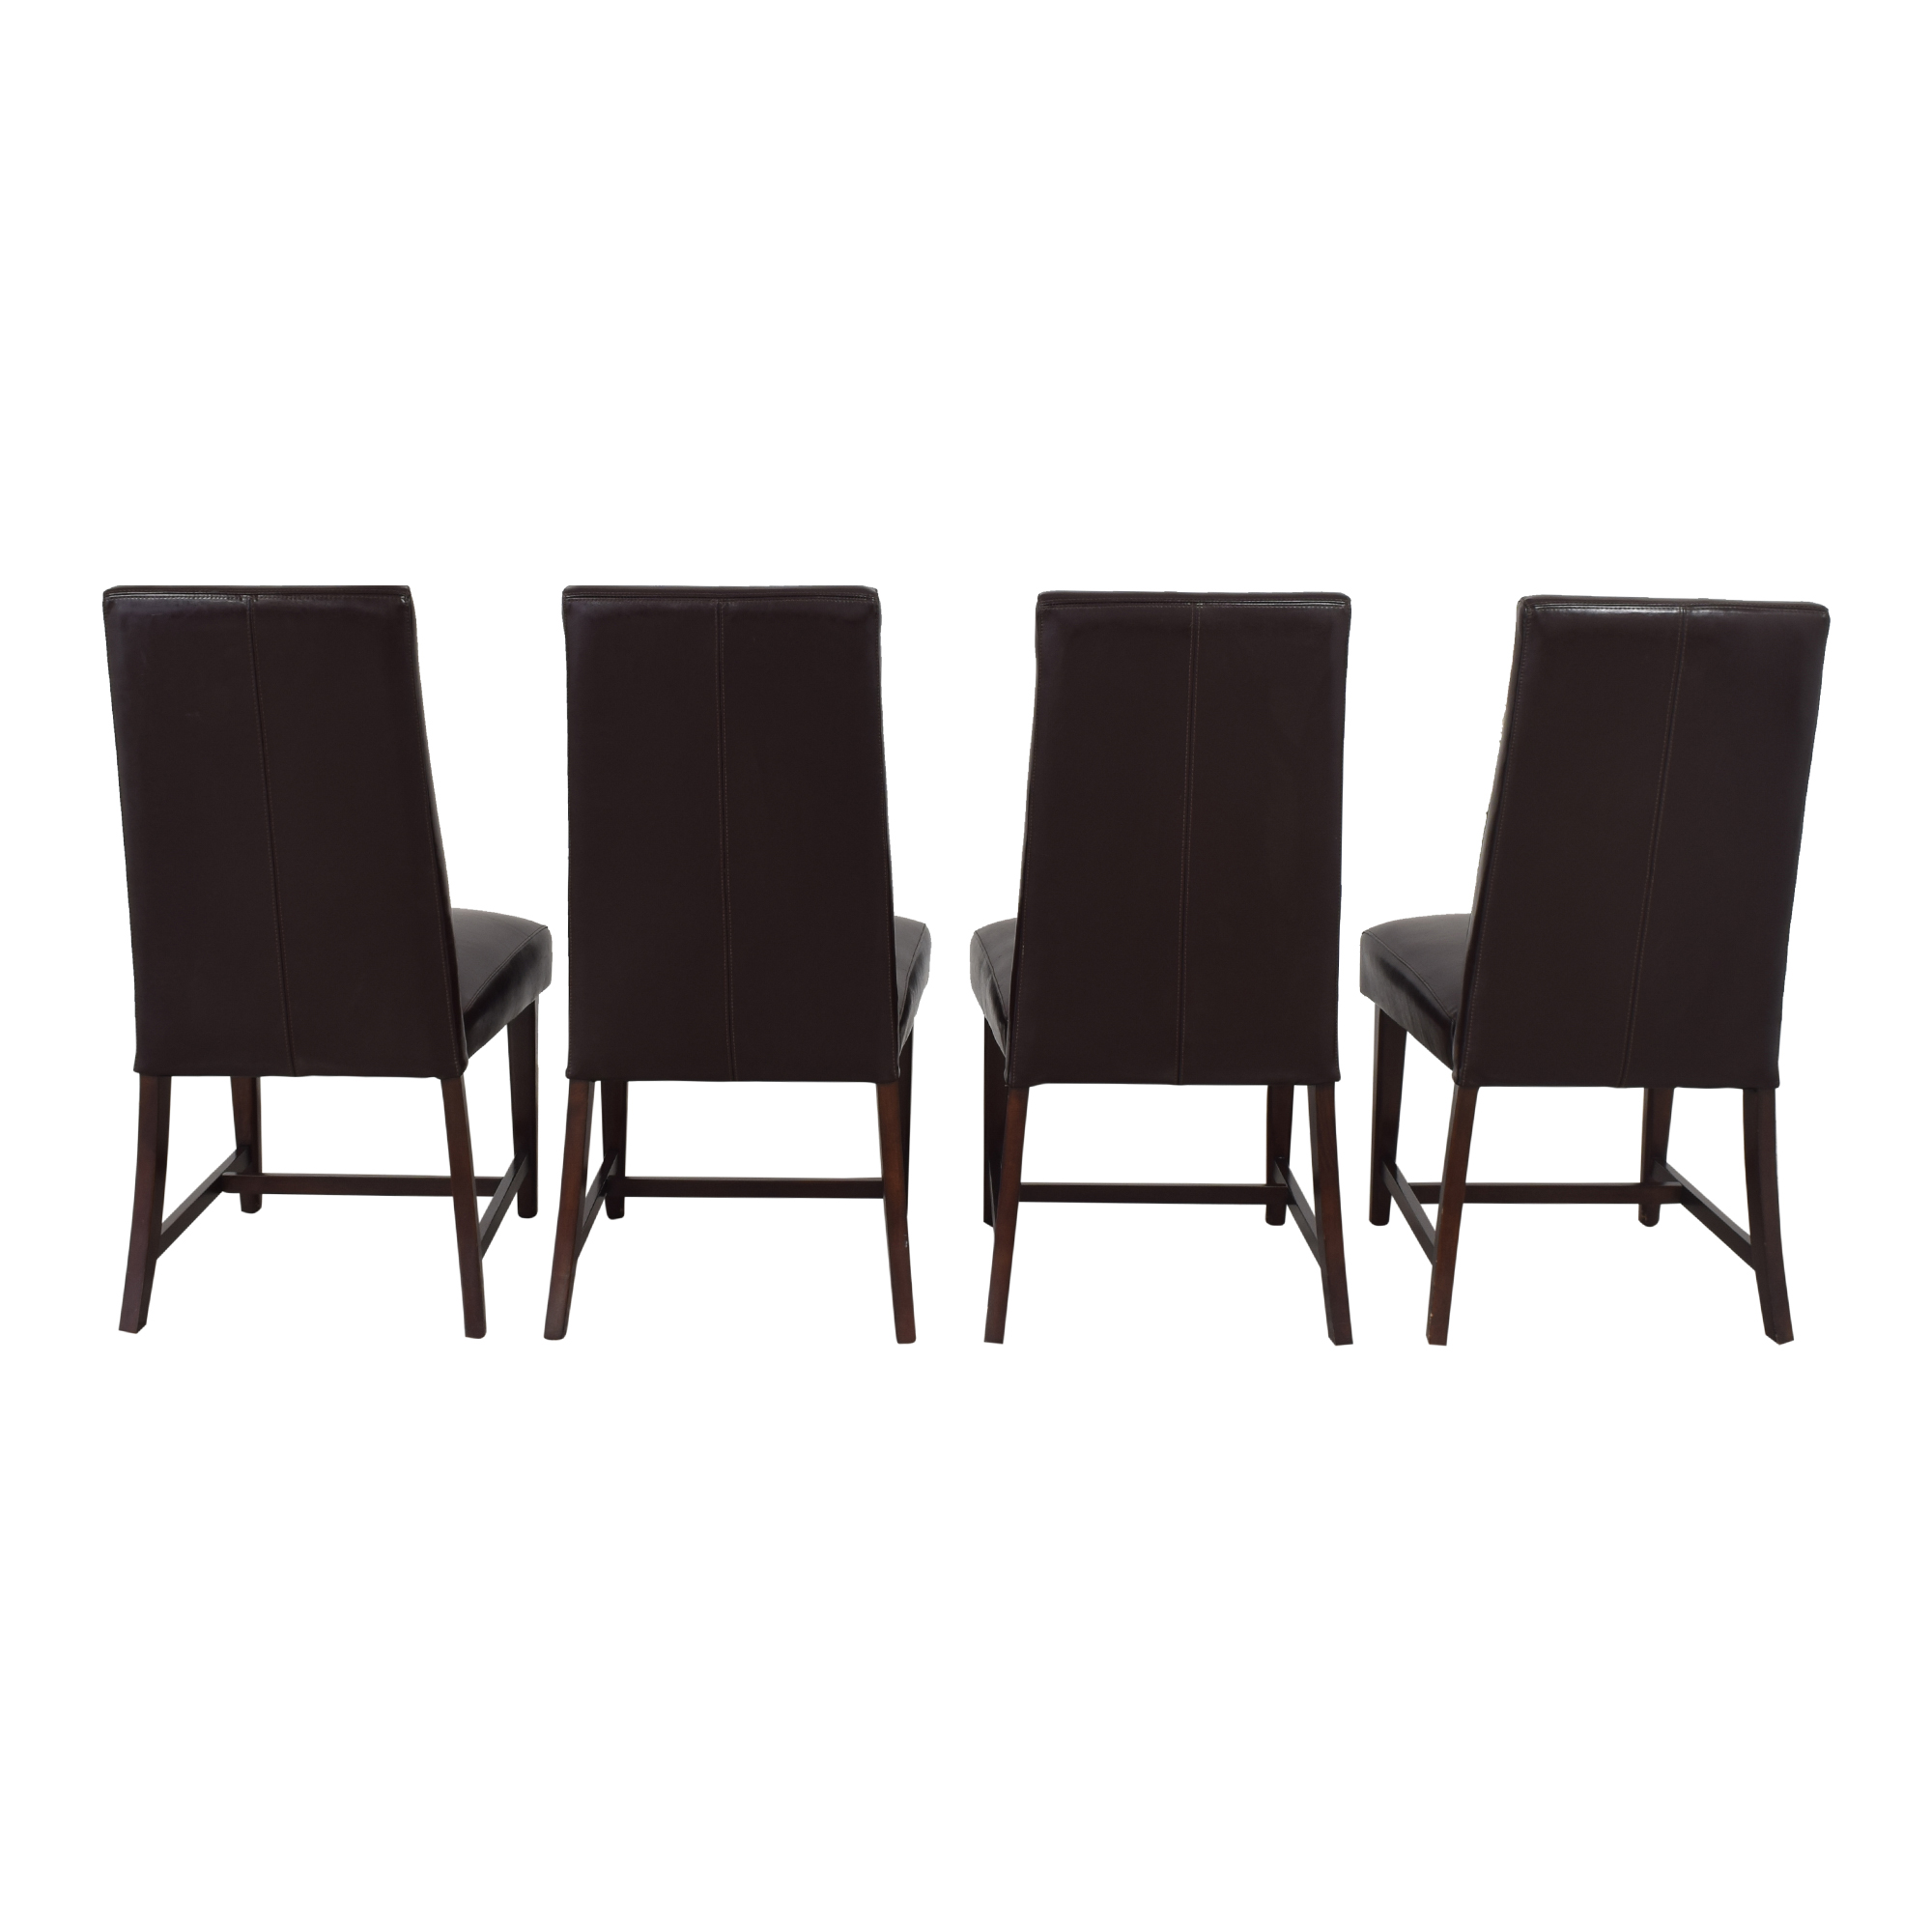 Shermag Shermag High Back Dining Chairs pa